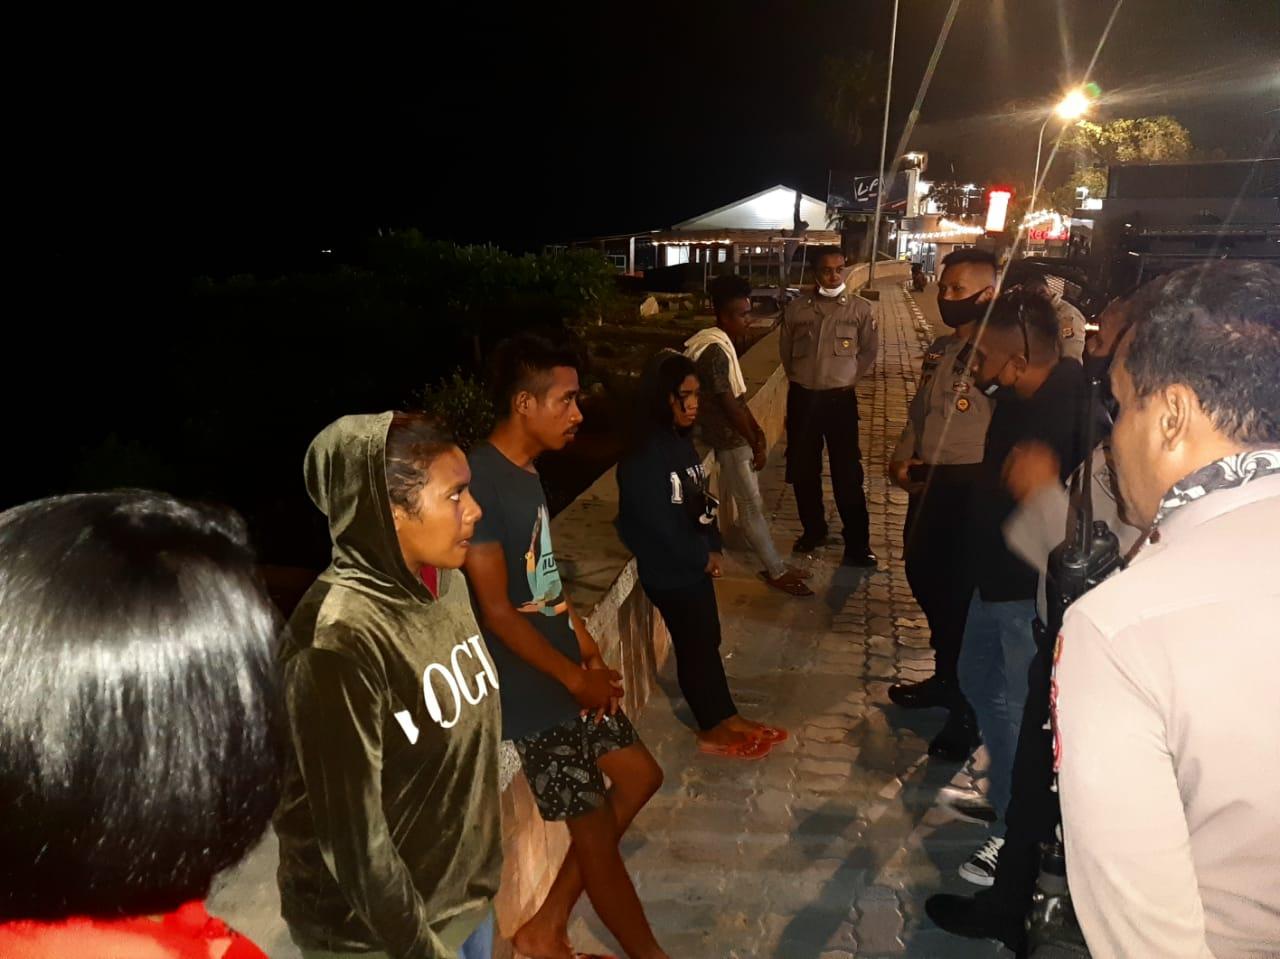 Satuan Sabhara Polres Kupang Kota Bubarkan Sekelompok Pemuda Yang Berkumpul Serta Berikan Himbauan Terkait Pencegahan Virus Corona